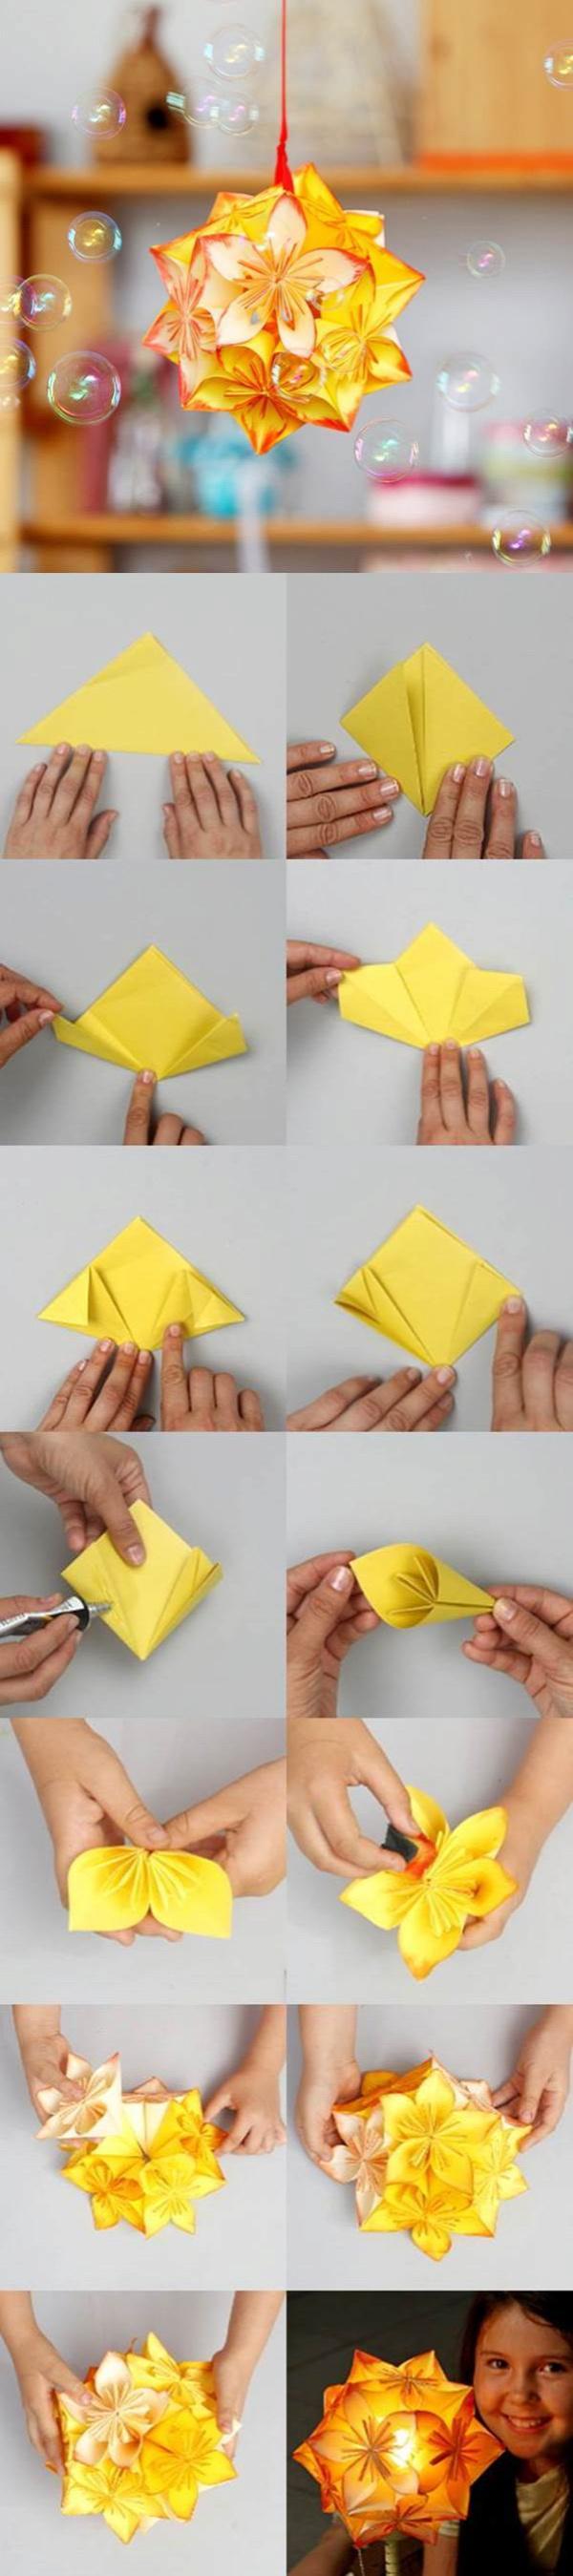 origami kusudama hajtogatás kusudama virág